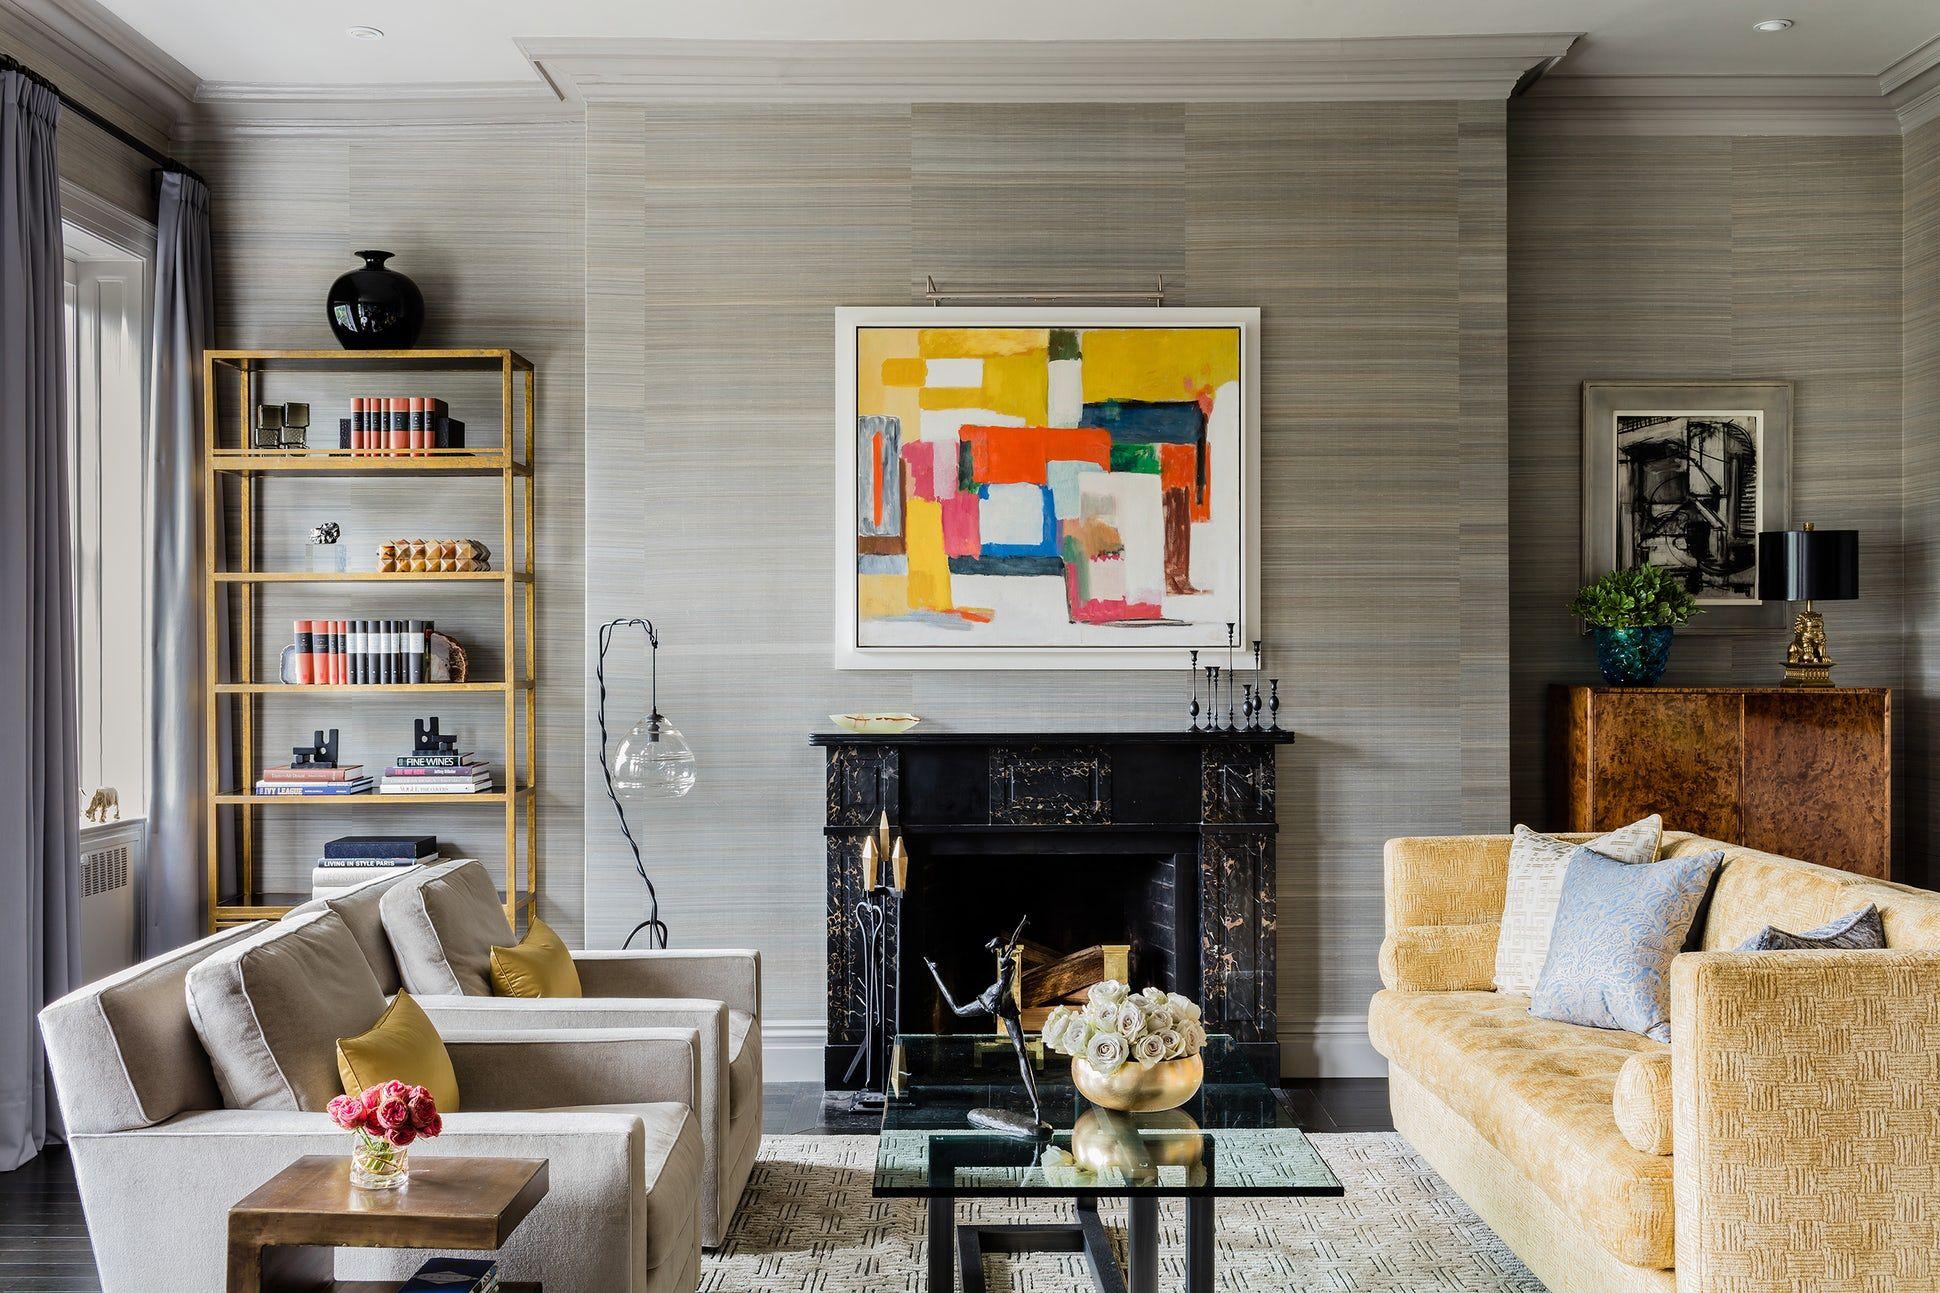 65 best fireplace ideas beautiful fireplace designs decor - Living Room Fireplace